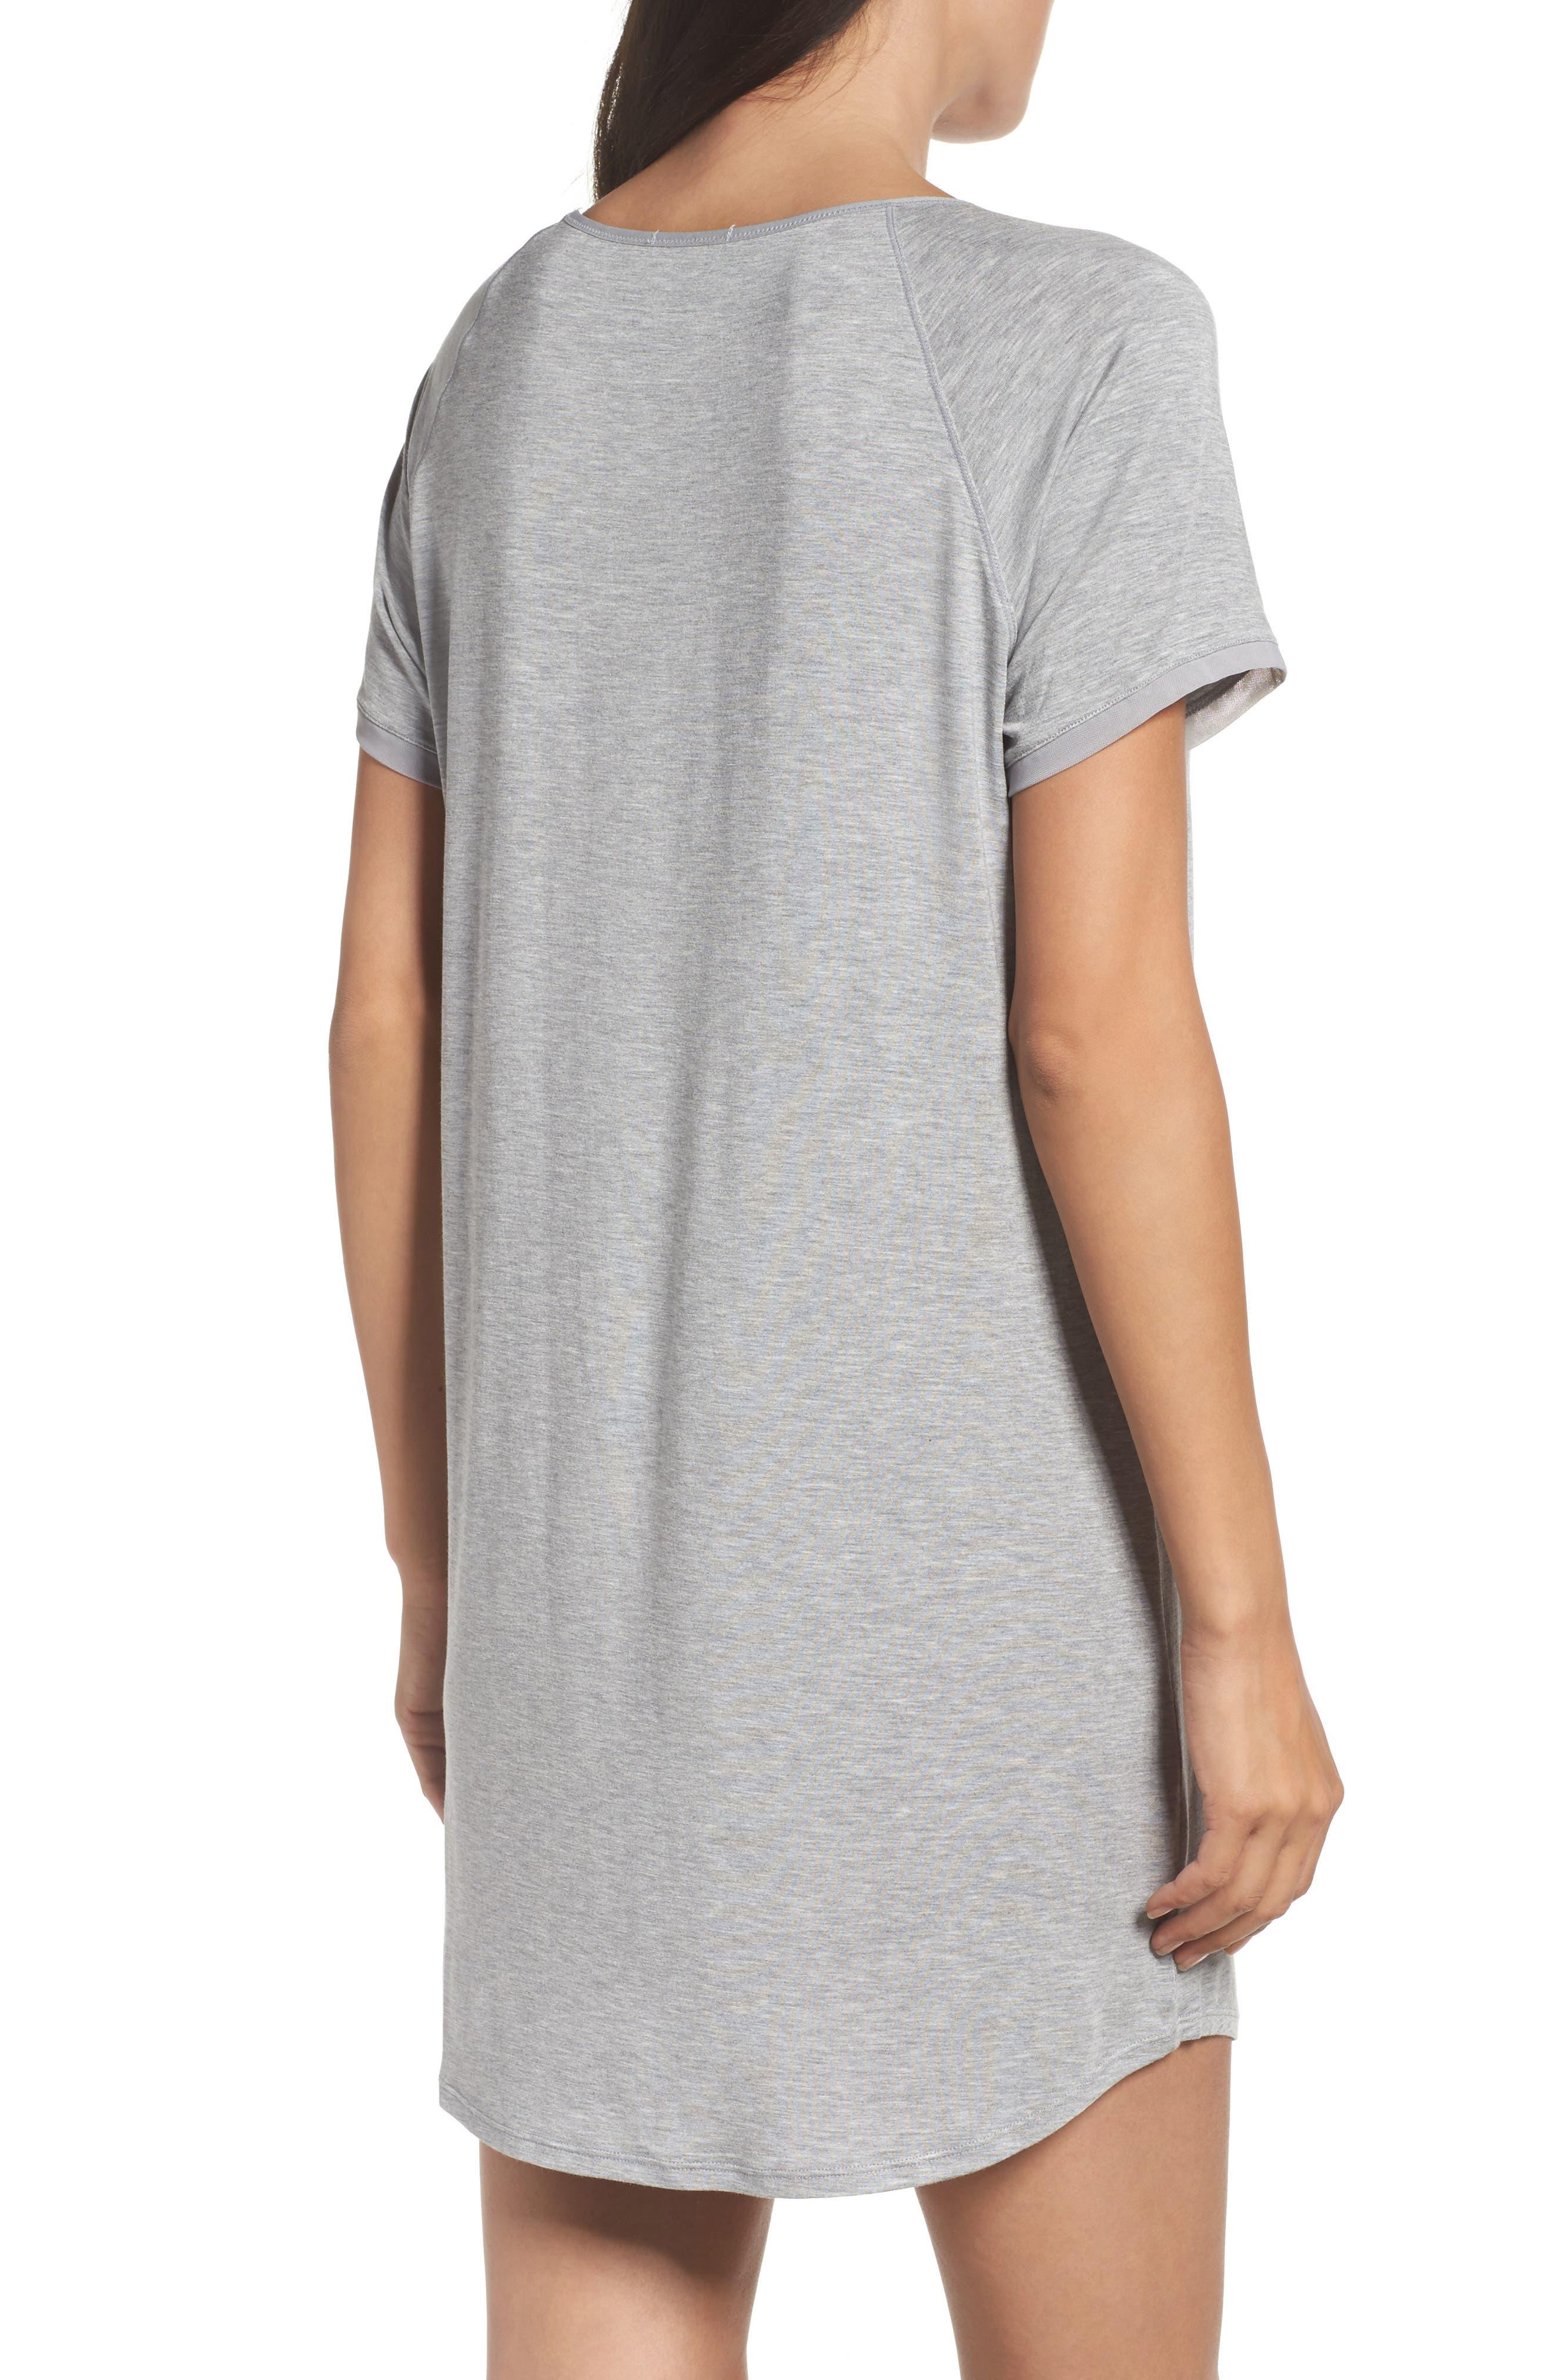 Sleep Shirt,                             Alternate thumbnail 5, color,